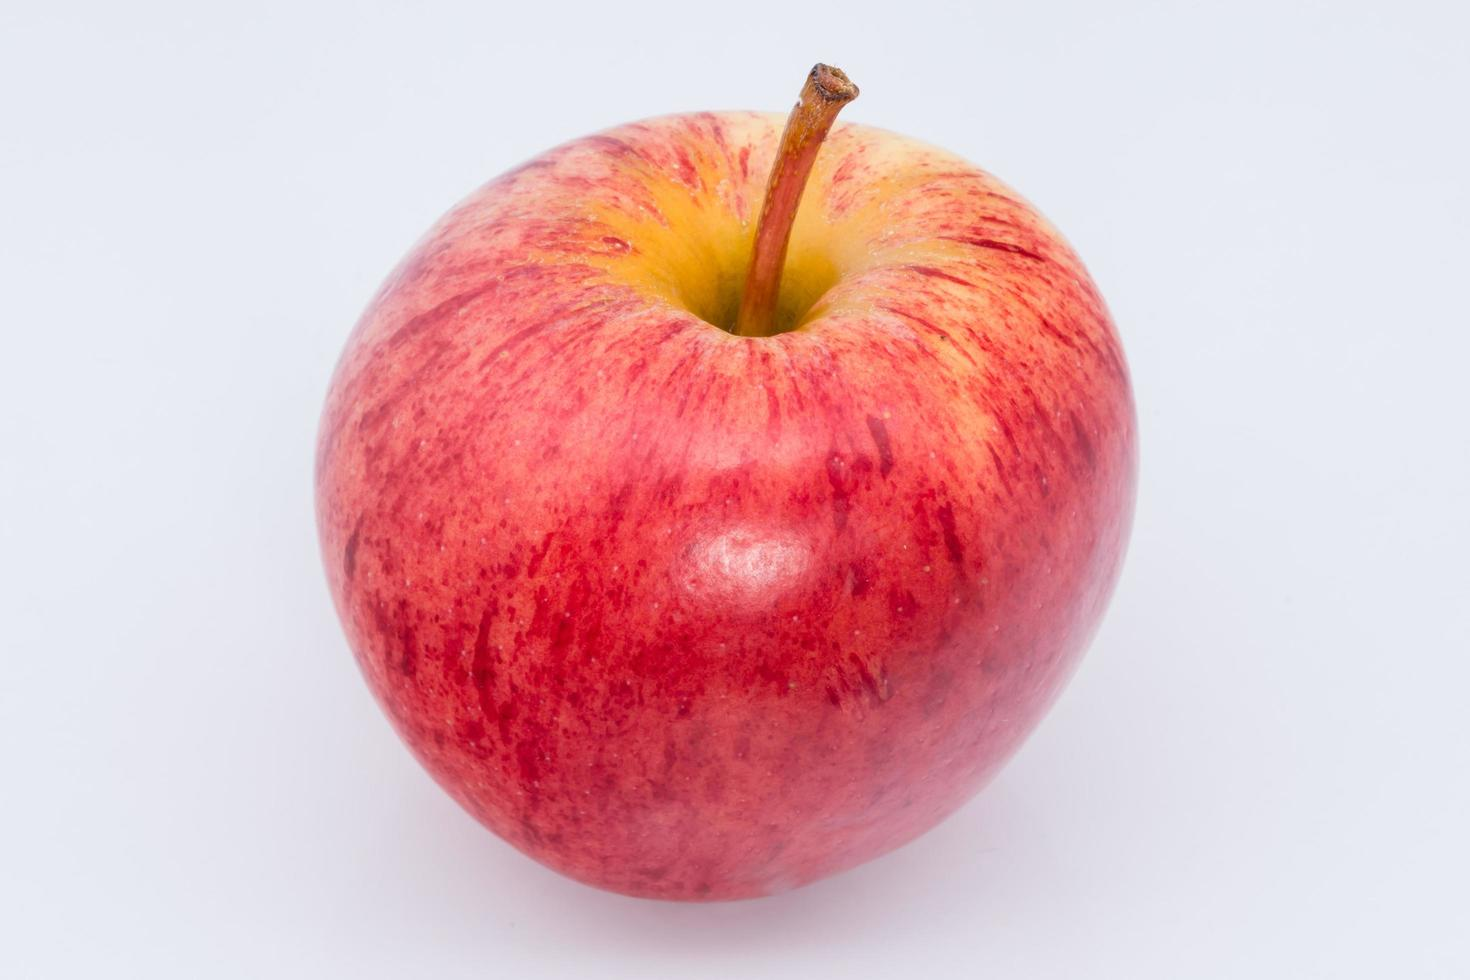 mela su sfondo bianco foto